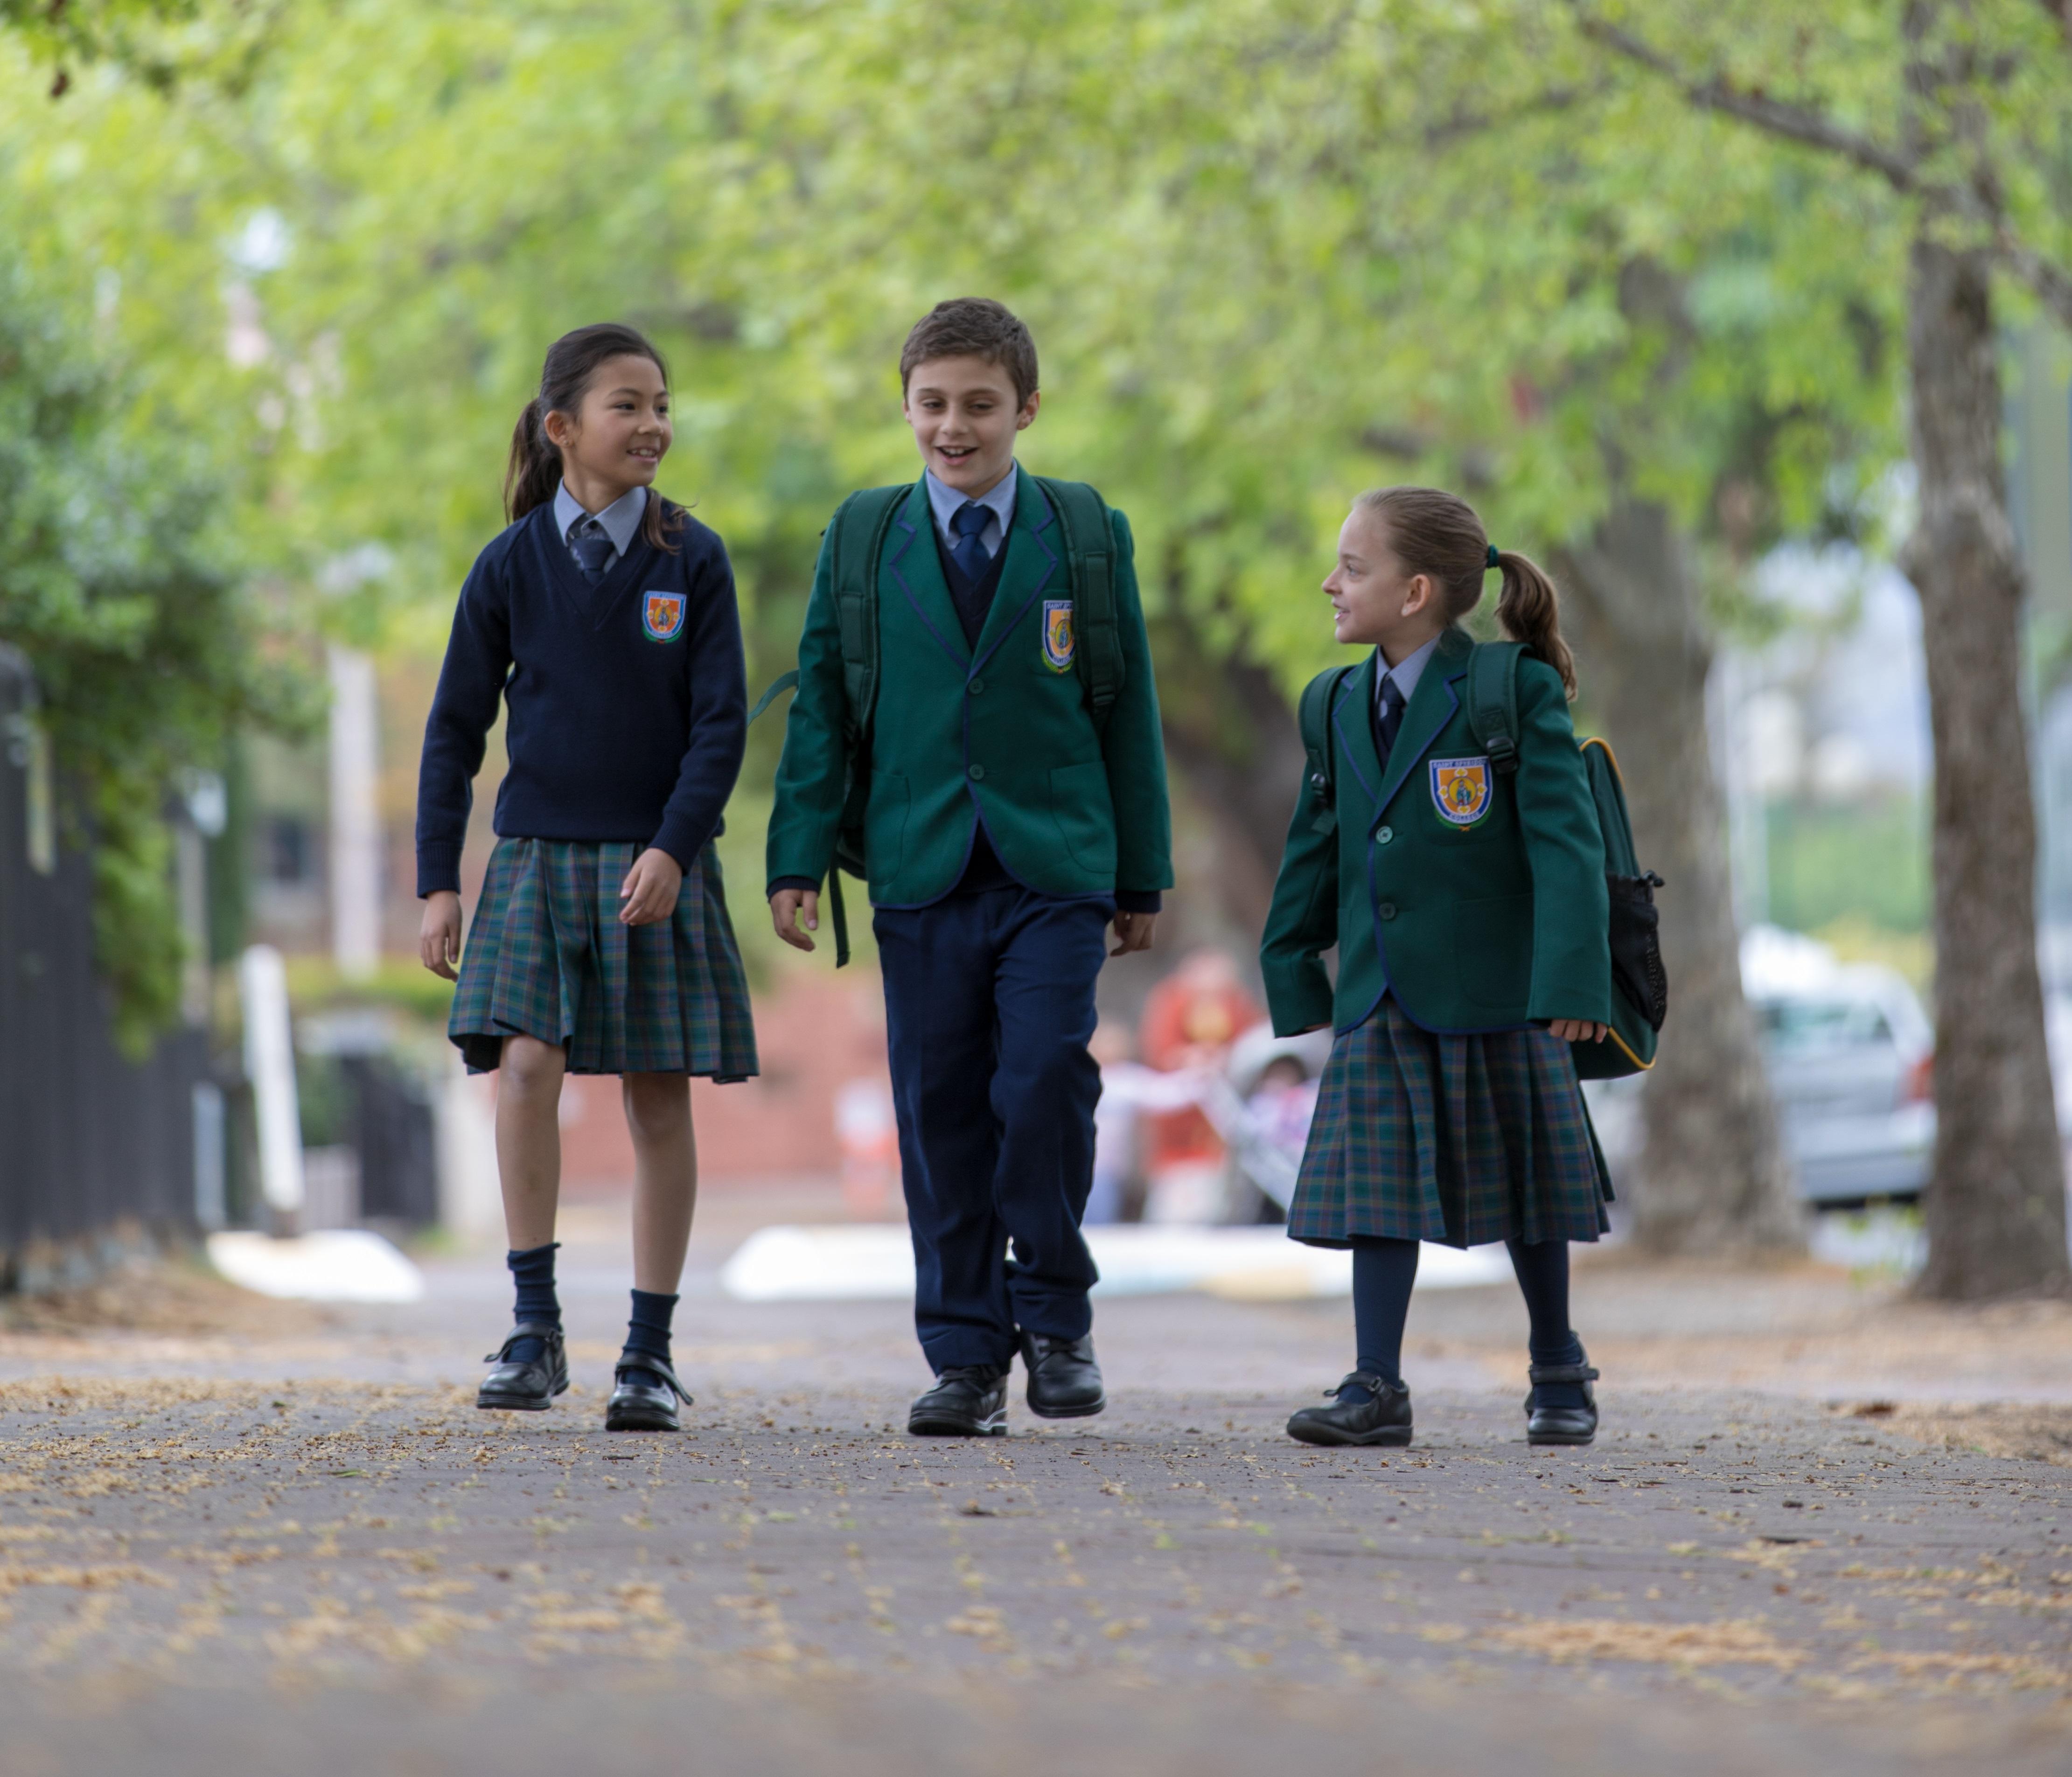 School Uniform – Saint Spyridon College